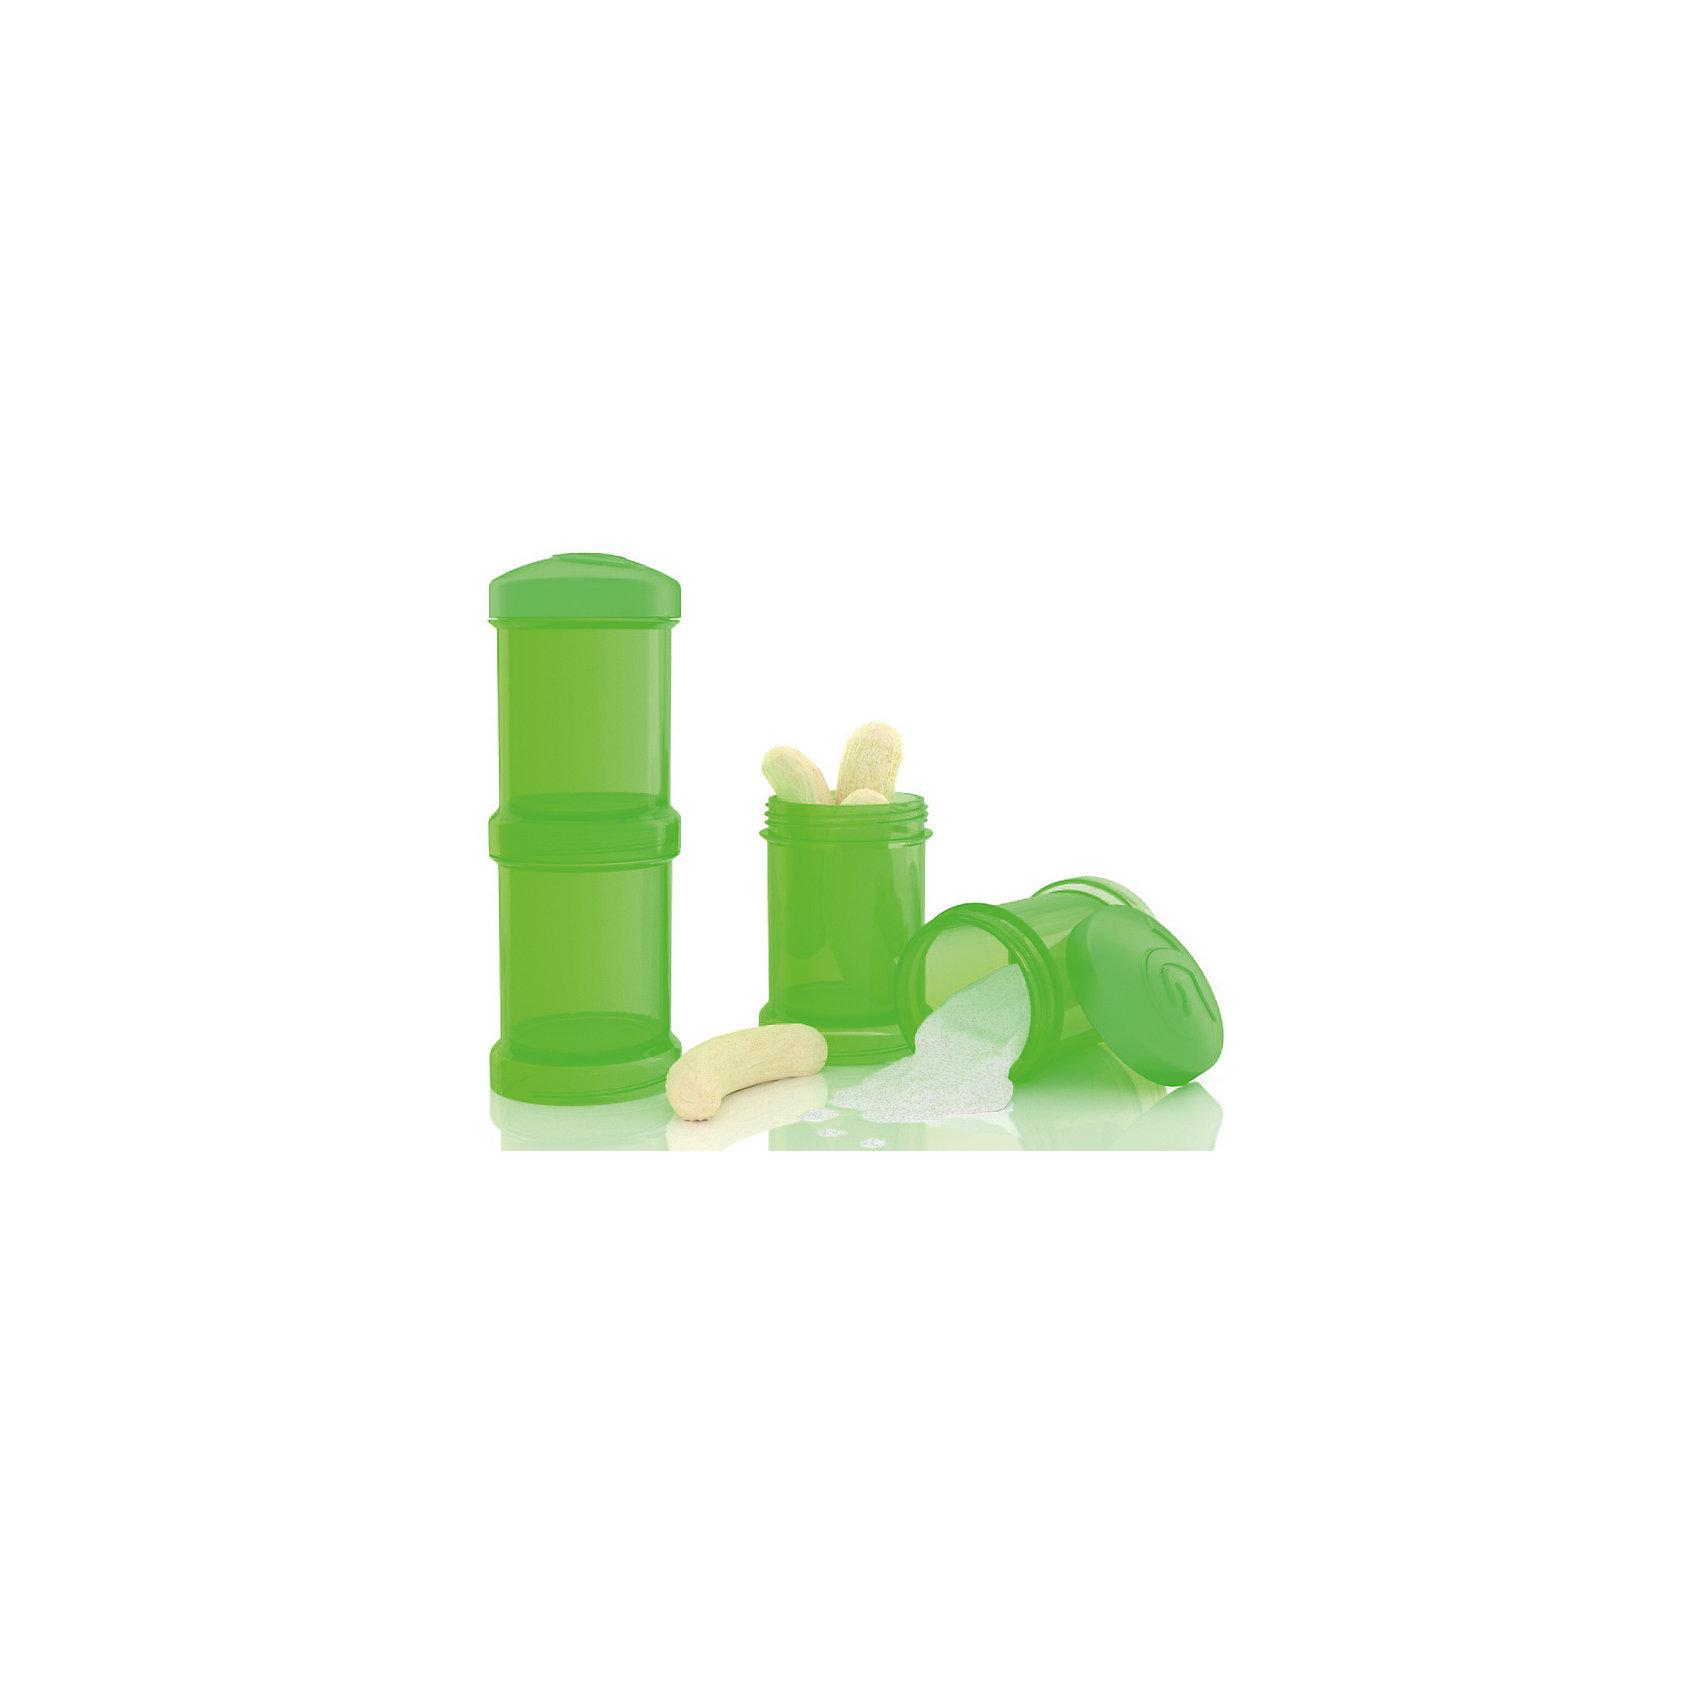 Контейнер для сухой смеси 100 мл. 2 шт., TwistShake, зелёный (Twistshake)